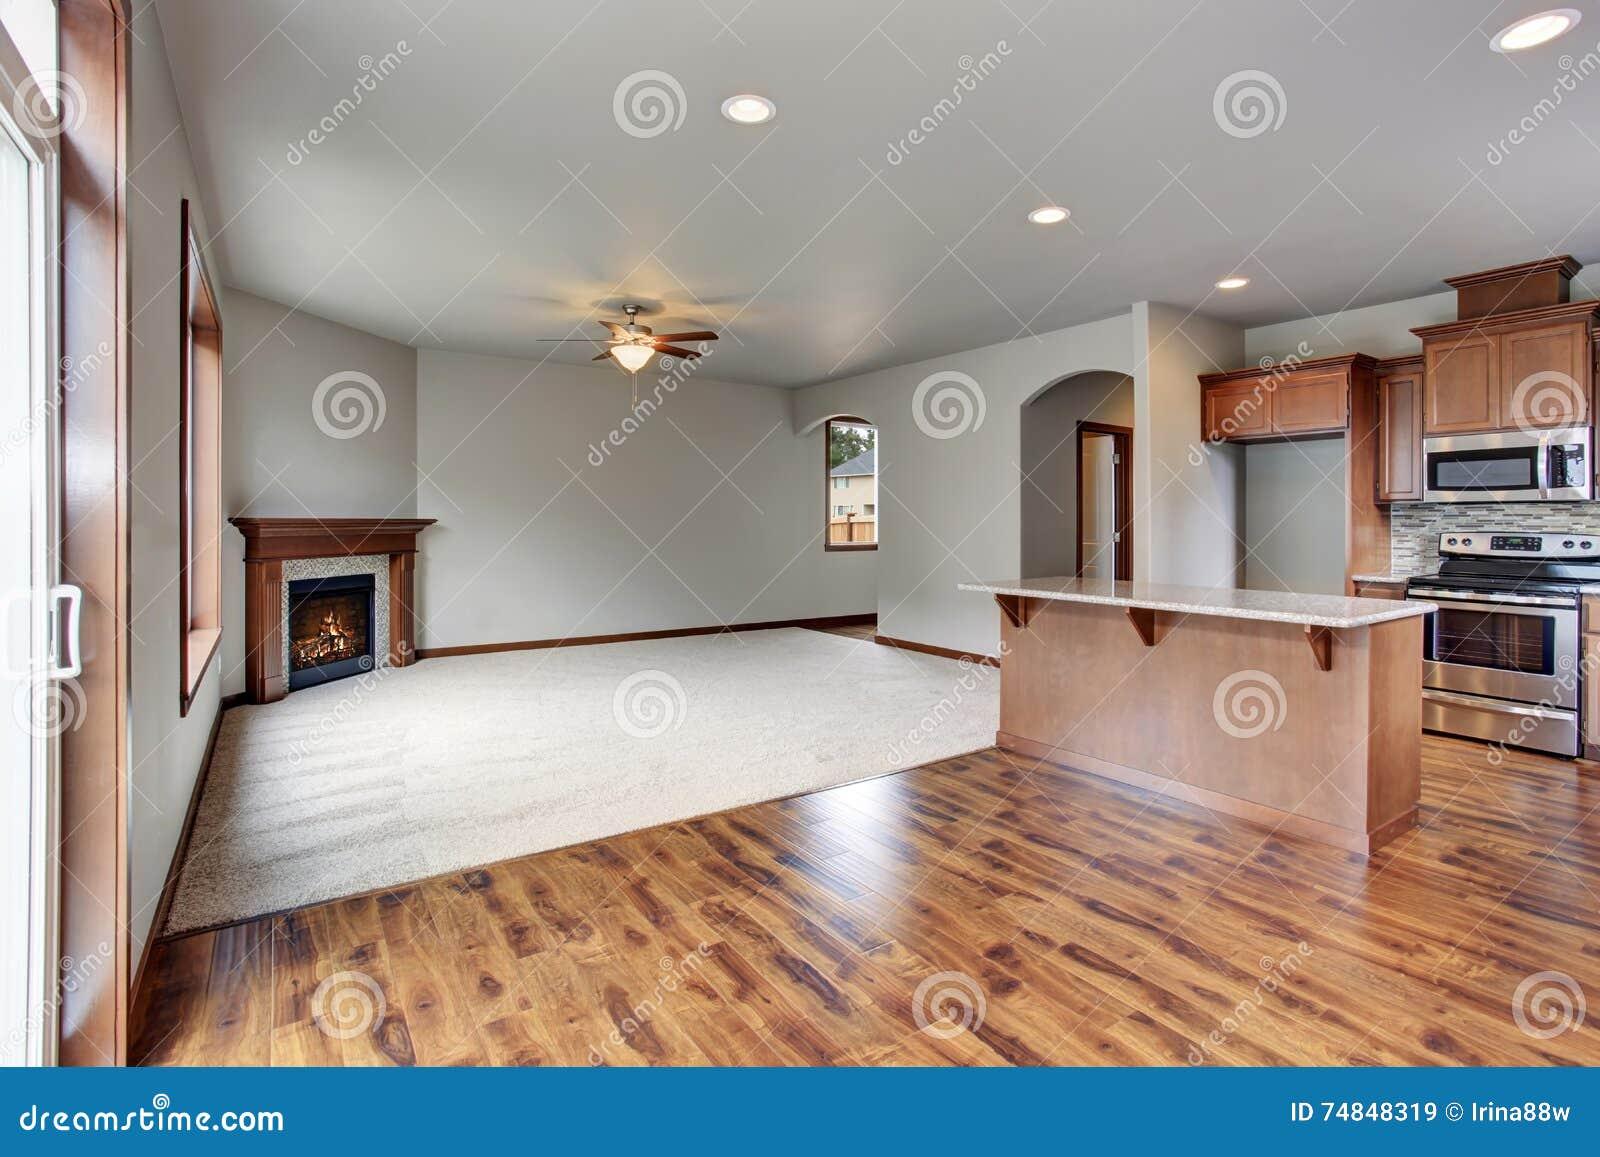 Beautiful Kitchen Interior New Luxury Home Stock Photo ...